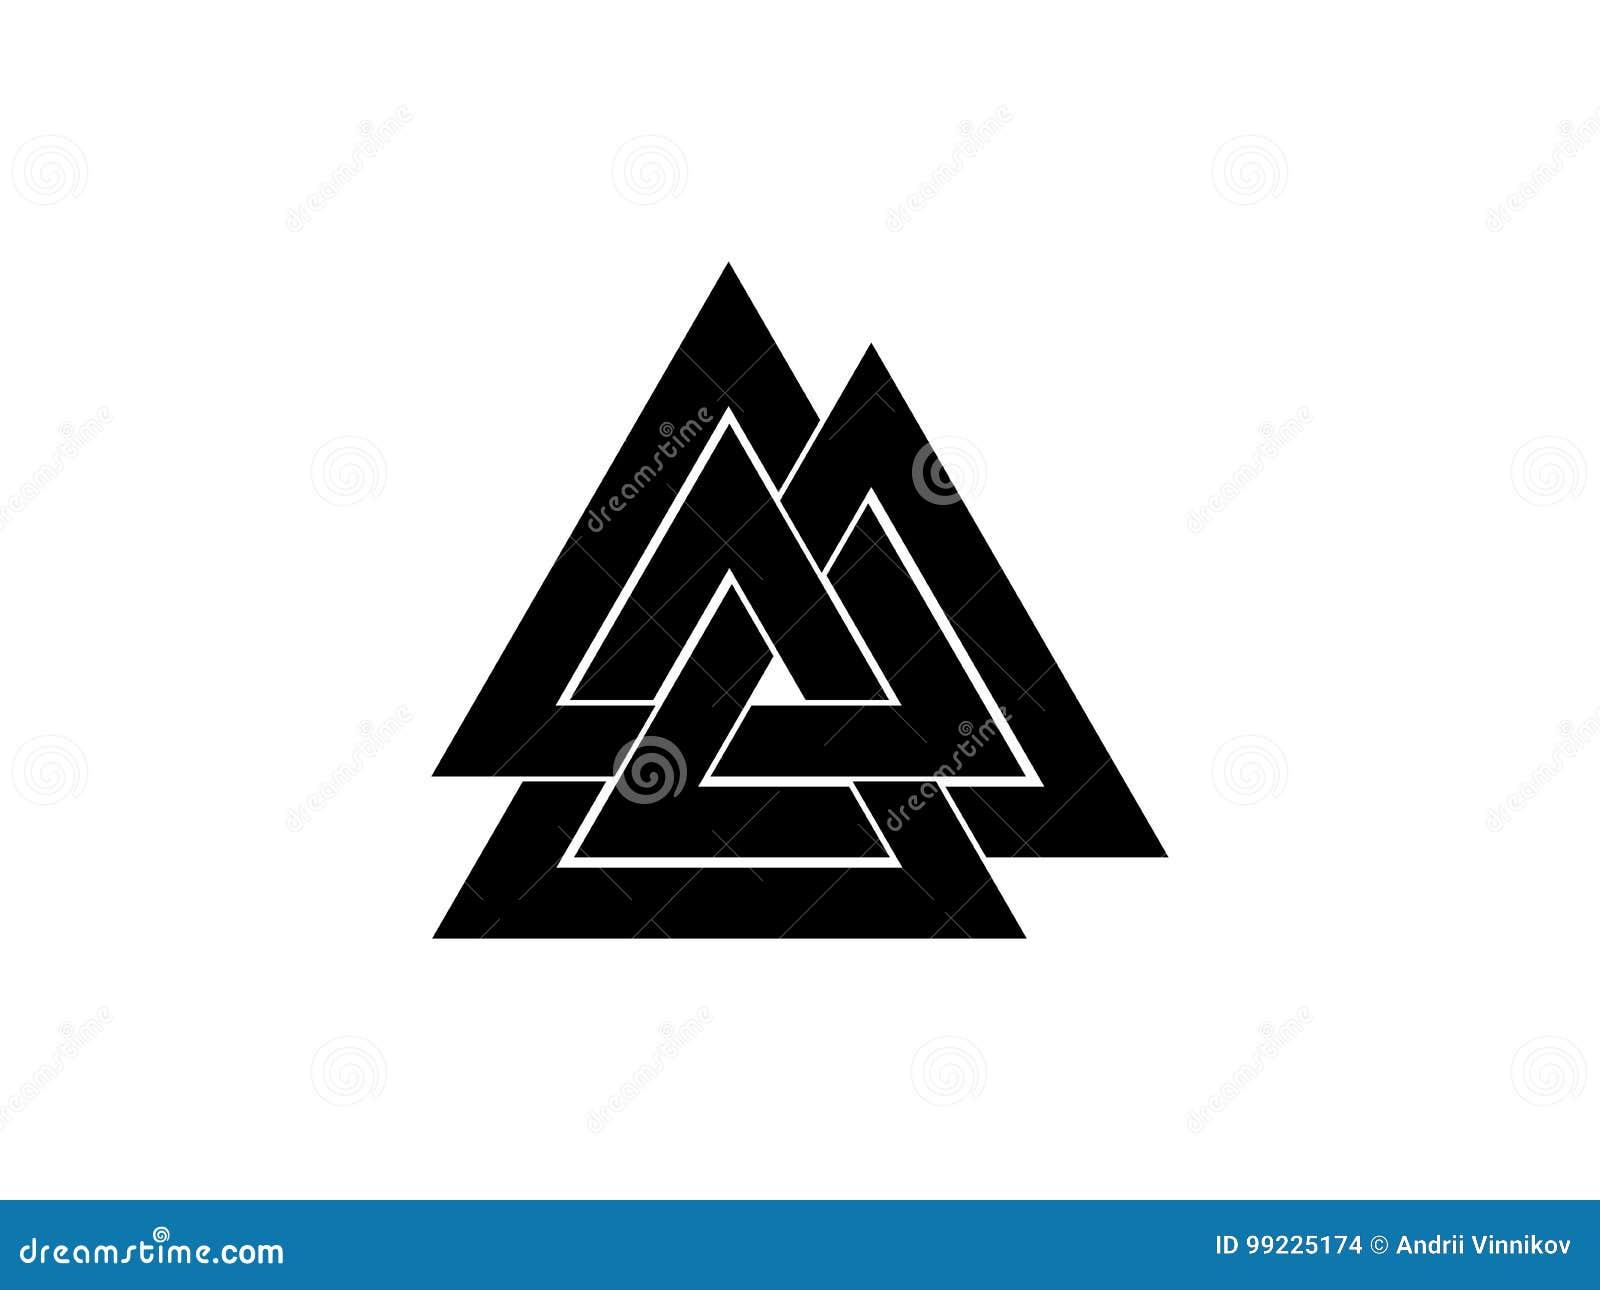 Valknut es un símbolo del extremo del ` s del mundo del árbol Yggdrasil Muestra de dios Odin Cultura nórdica Insignia del triángu